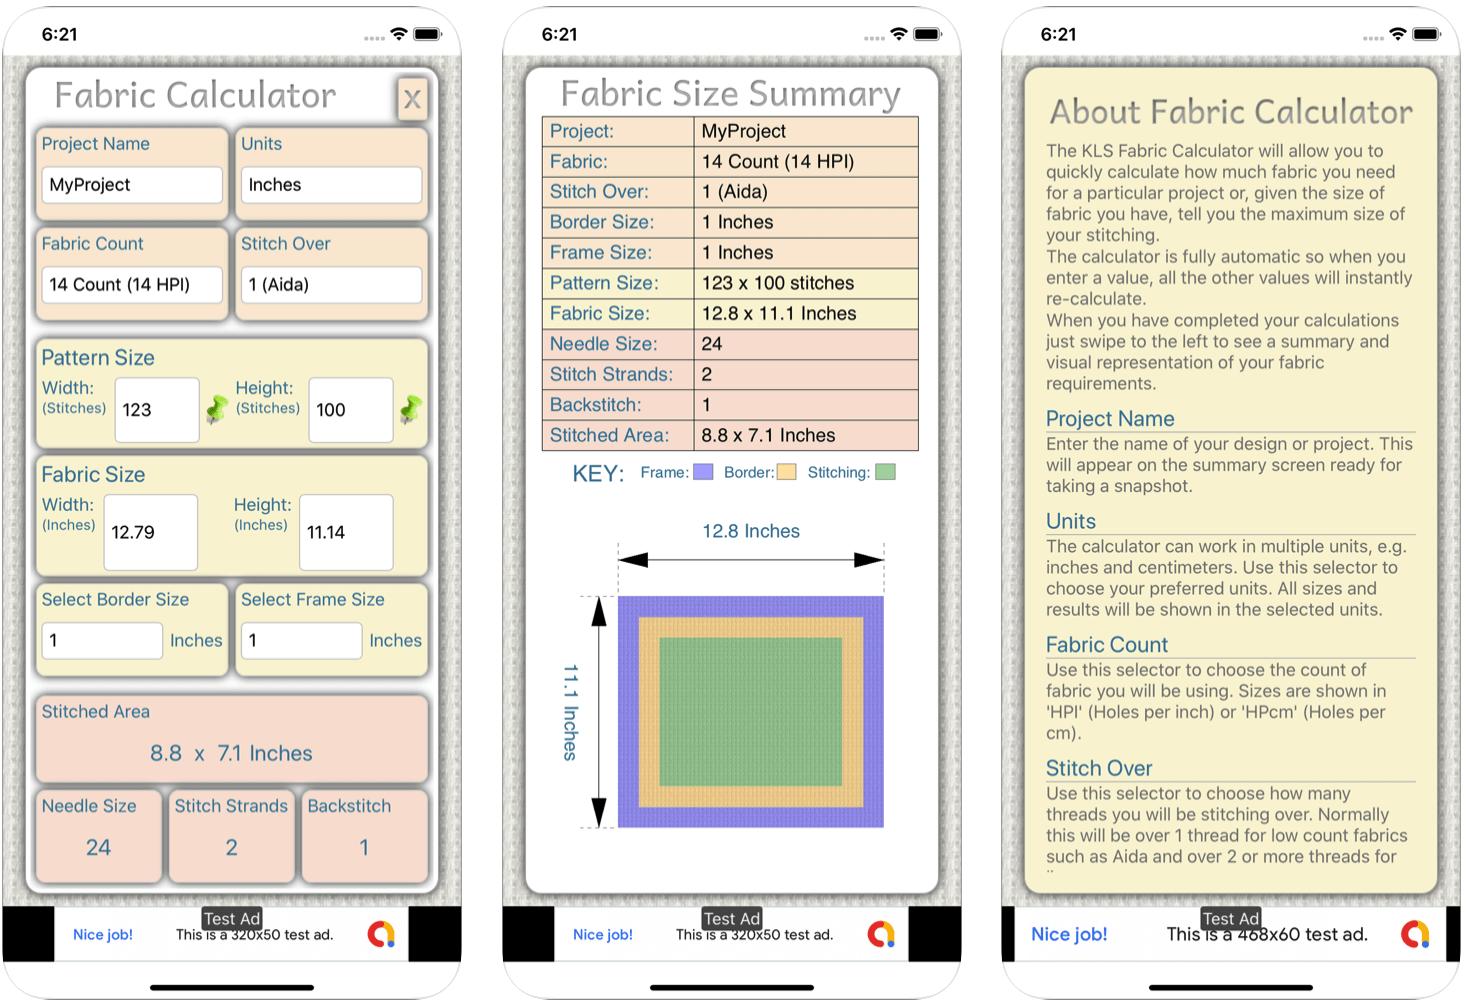 Fabric Calculator ios App Screenshots (Source: apps.apple.com)